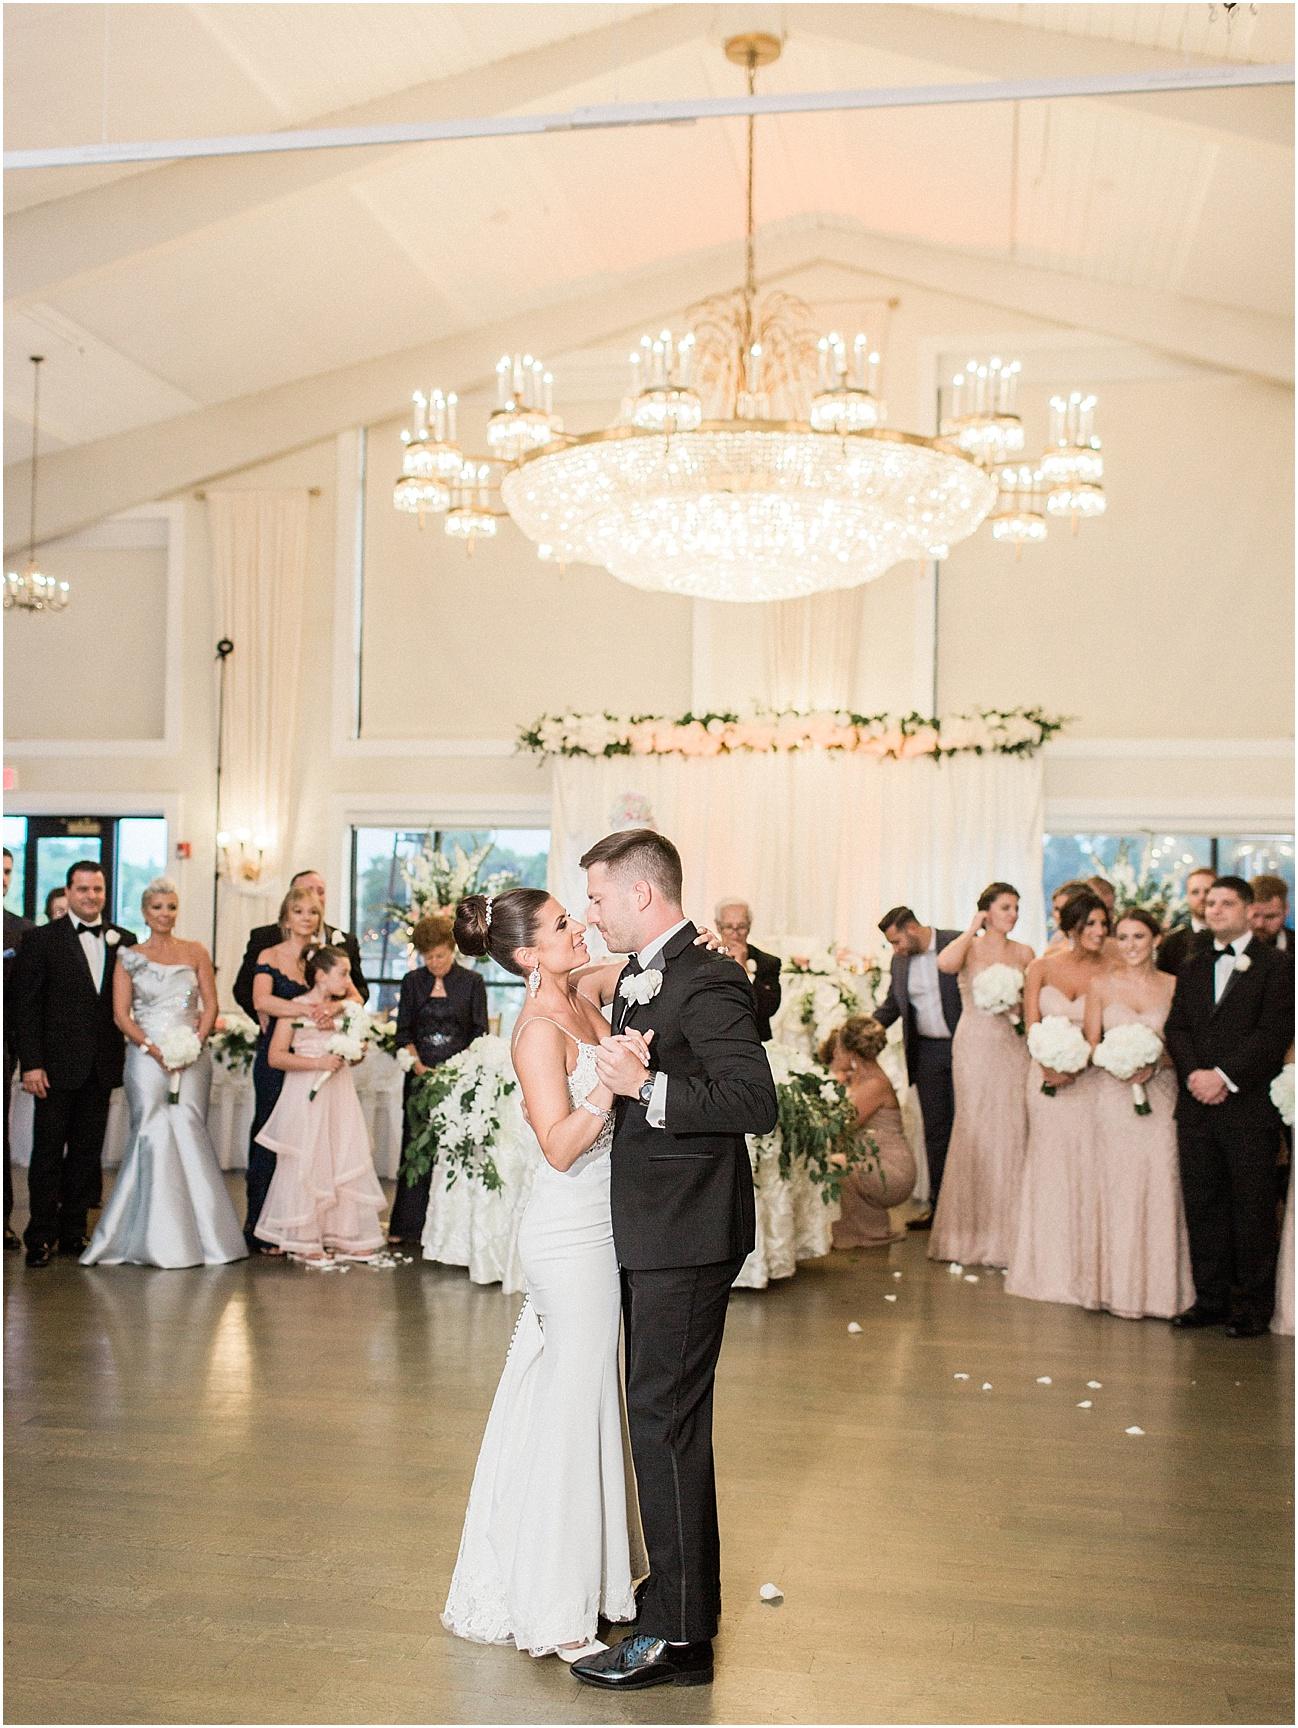 bianca_chris_danversport_italian_blush_gold_north_shore_cape_cod_boston_wedding_photographer_meredith_jane_photography_photo_1152.jpg